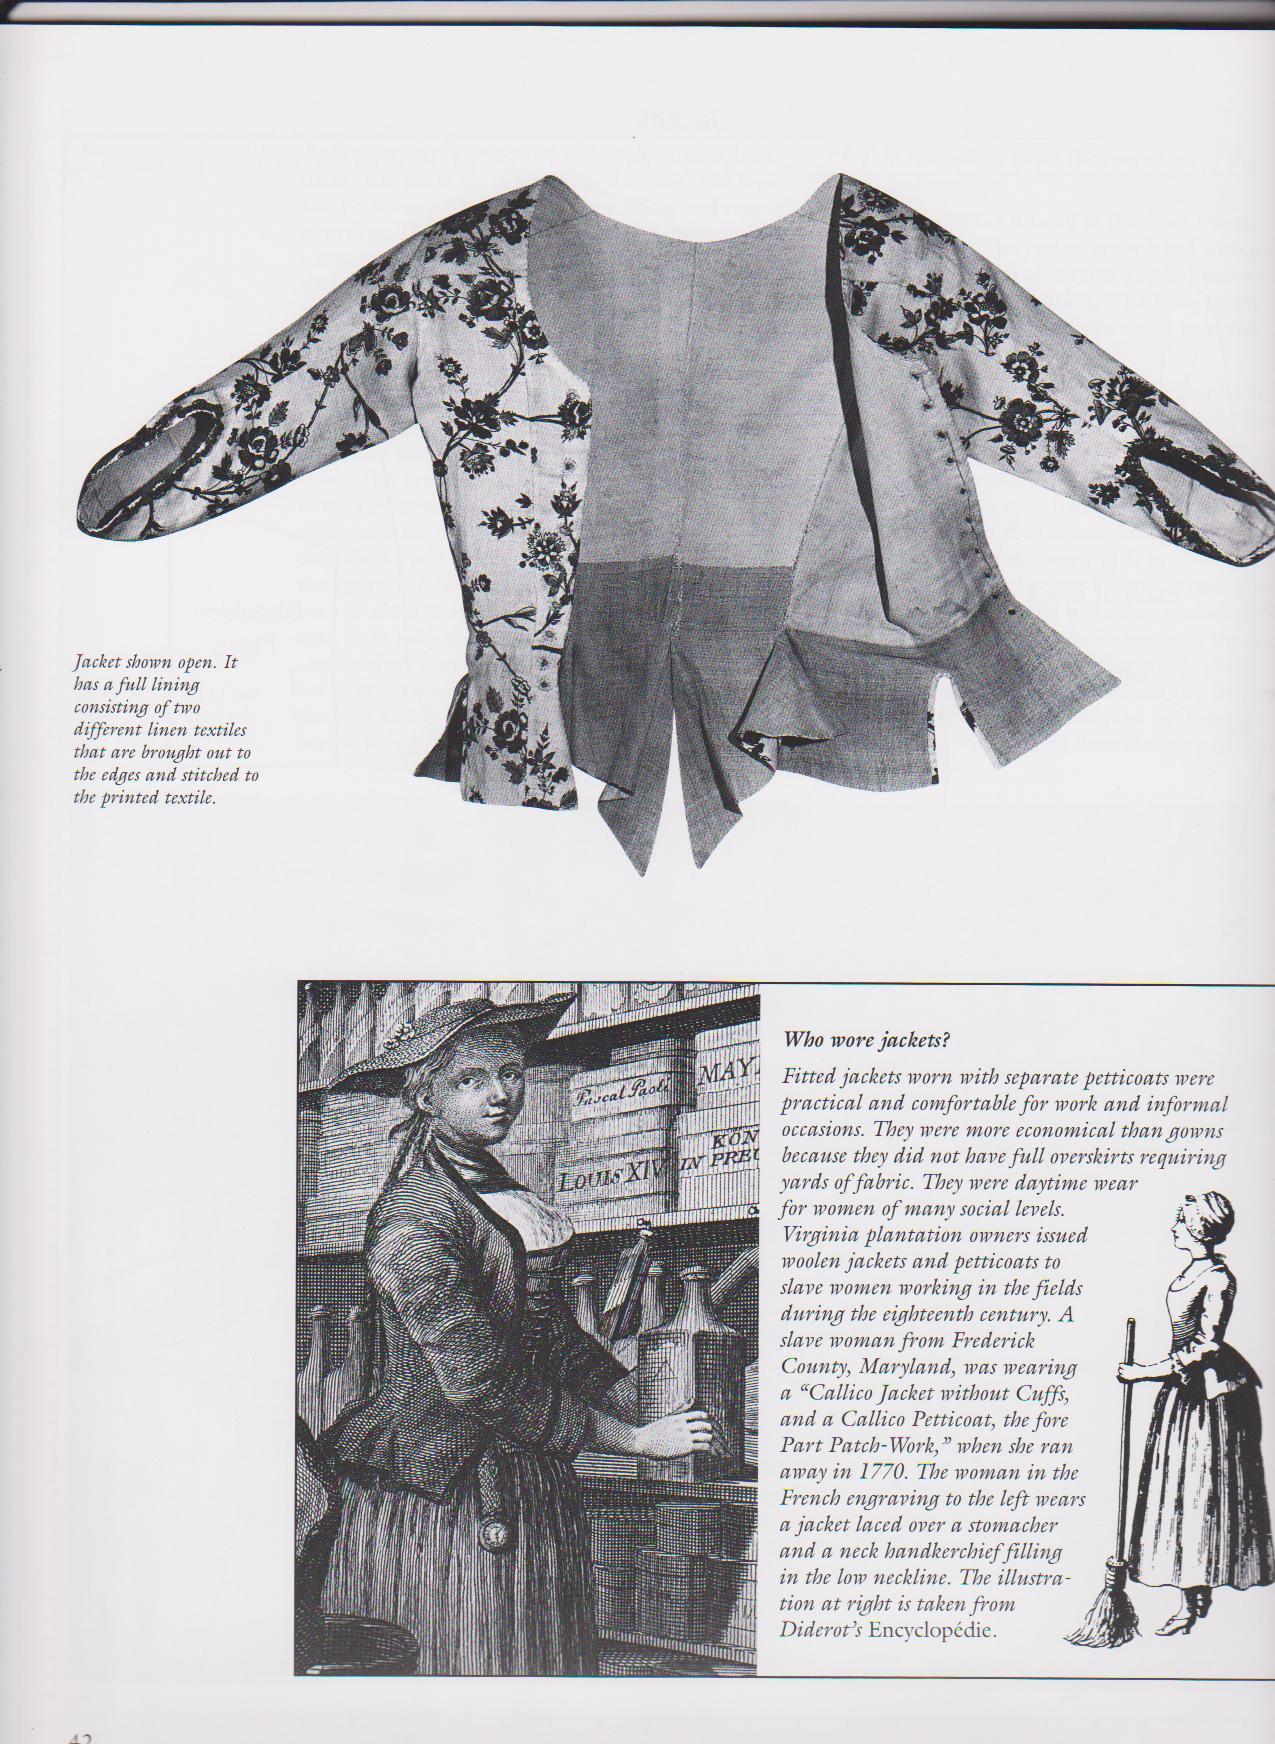 Costume Close Up - L.Baumgarten and J.Watson - Inner Page - Eighteenth Century Costume Research -Pet-en-lair - Caraco - Georgian Short Jacket - 18th Cent original clothing - Linen and floral linen - Undress - Day wear - HandBound Bibliography